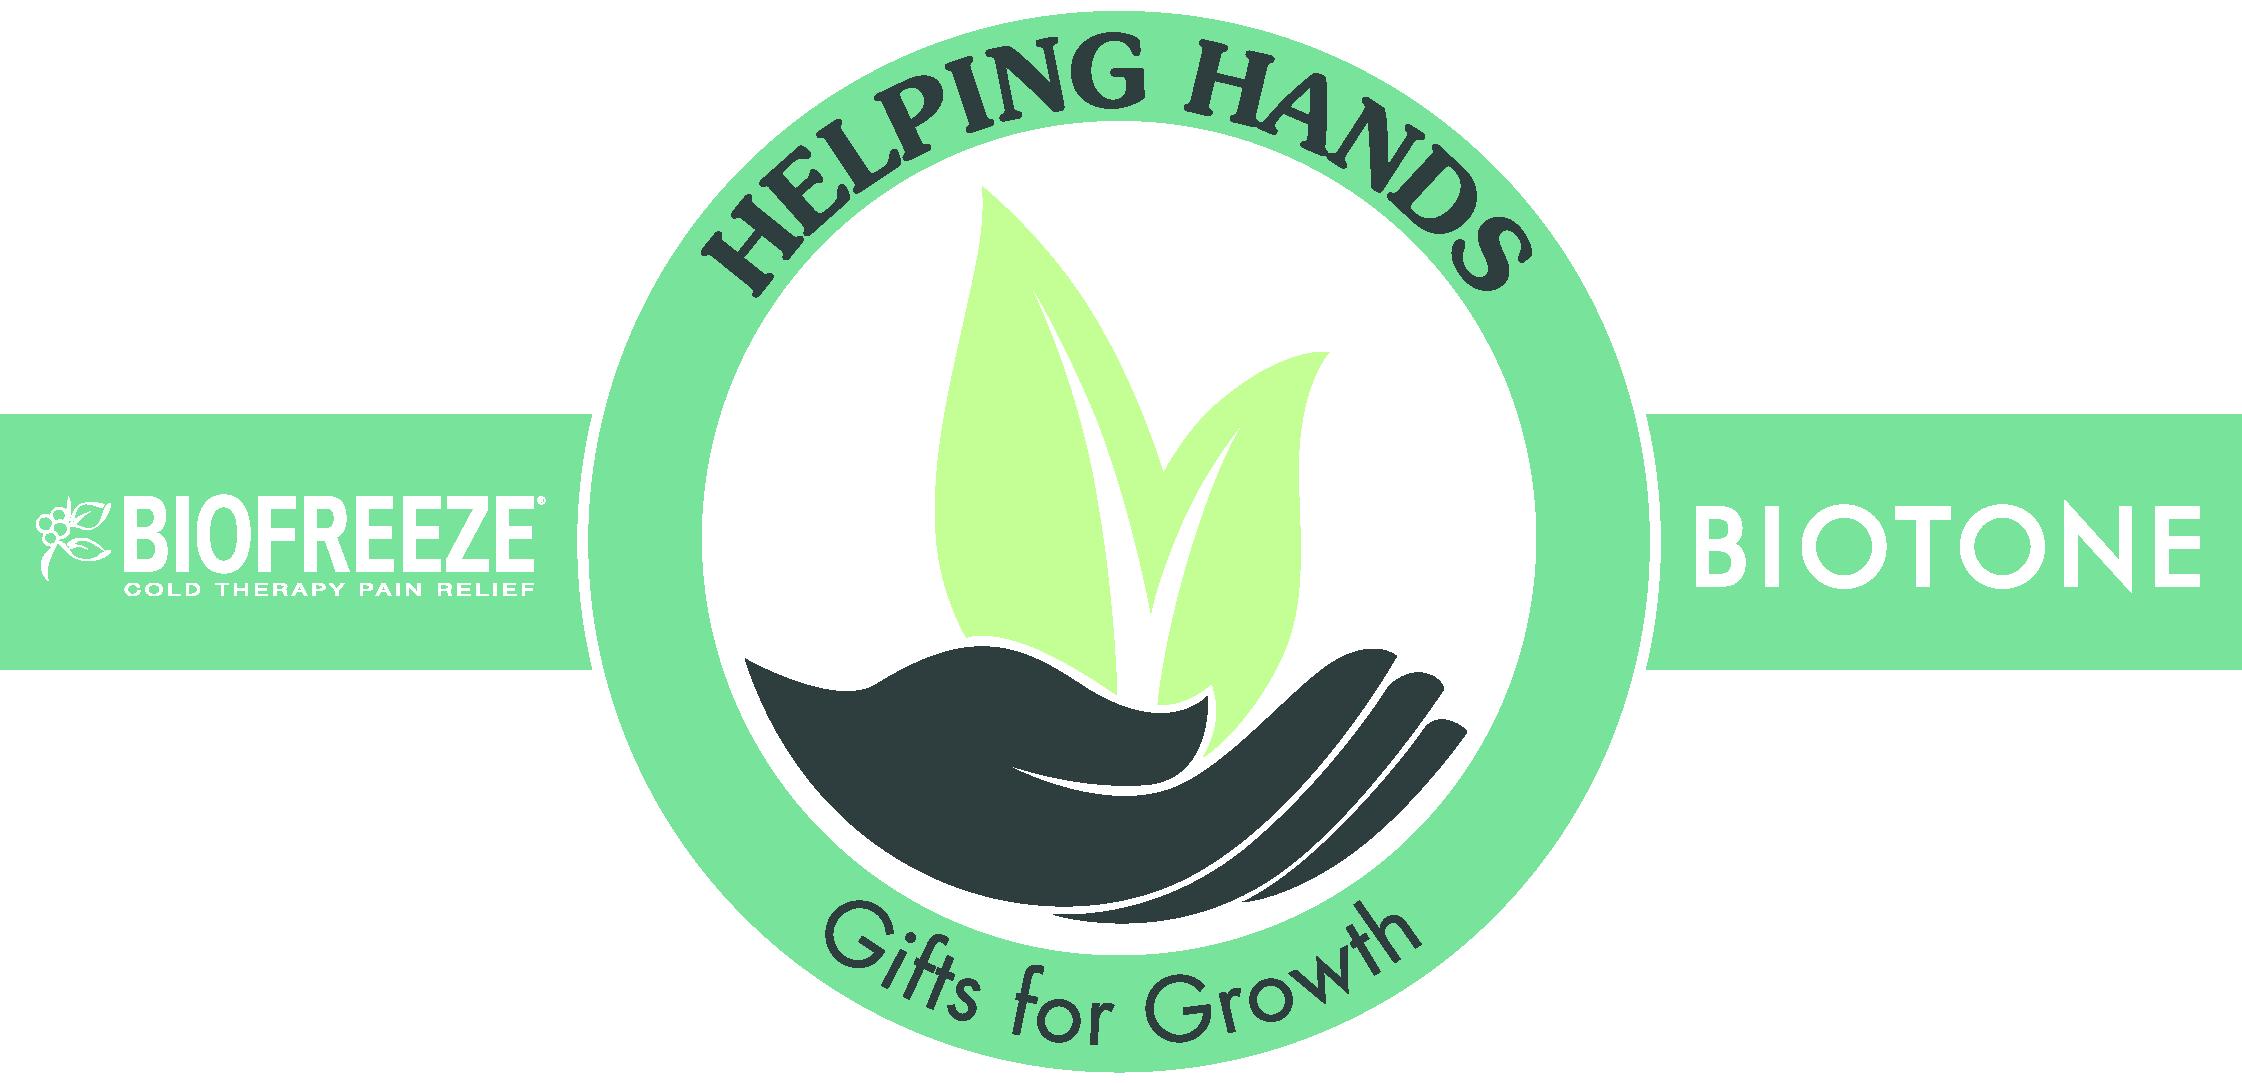 helping_hands_logo_3-22-13